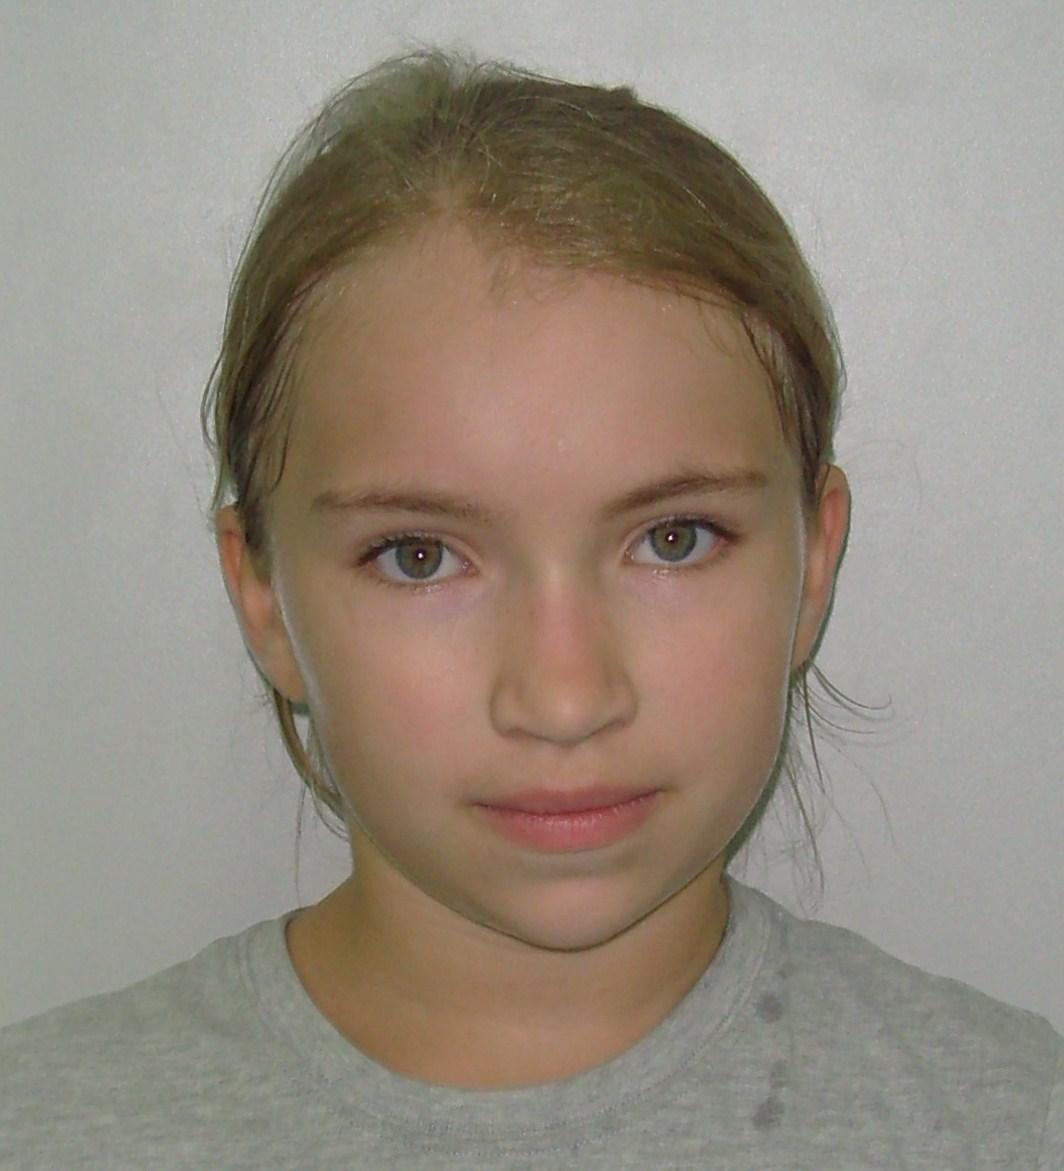 https://efc-prod.s3.amazonaws.com/people/ralina-yakupova/cxr/yvz/yakupova.jpg